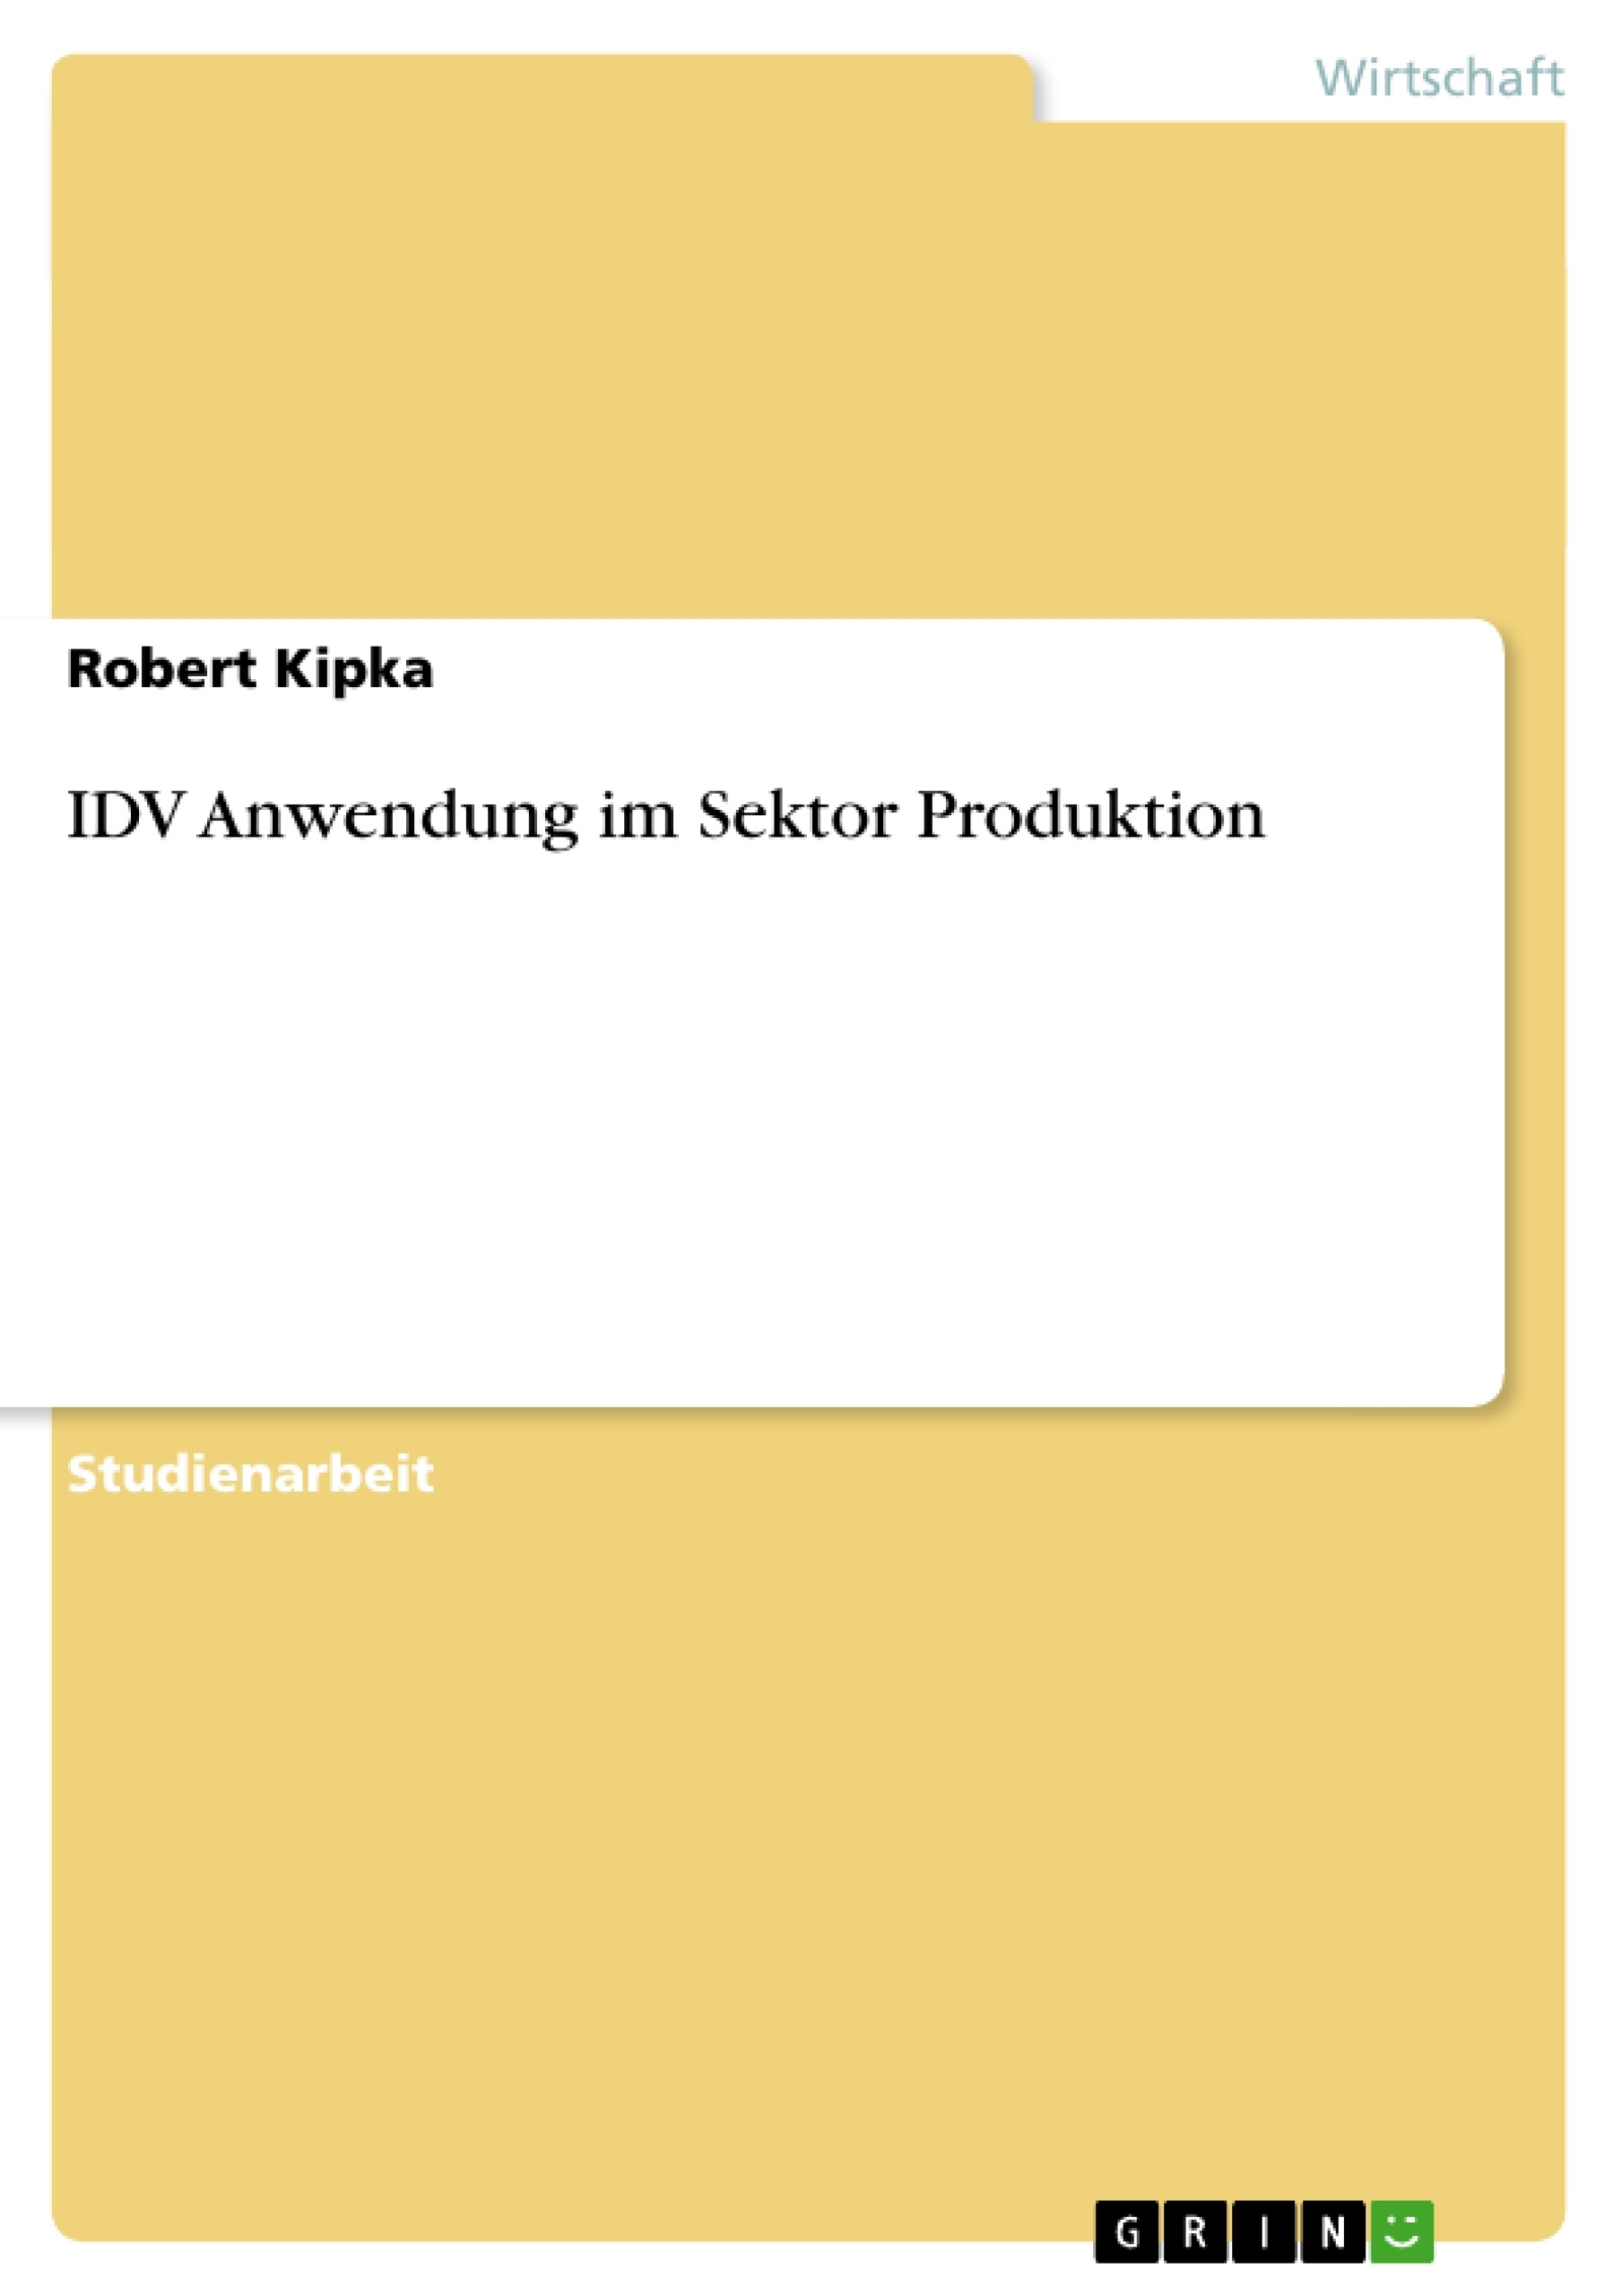 Titel: IDV Anwendung im Sektor Produktion